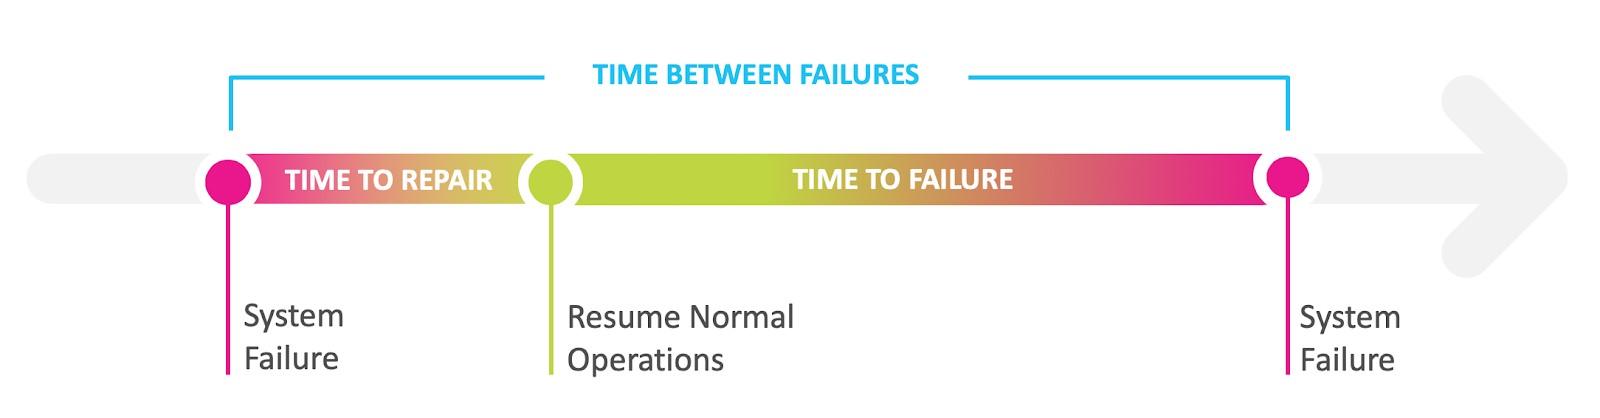 Differentiating Between Failure Metrics